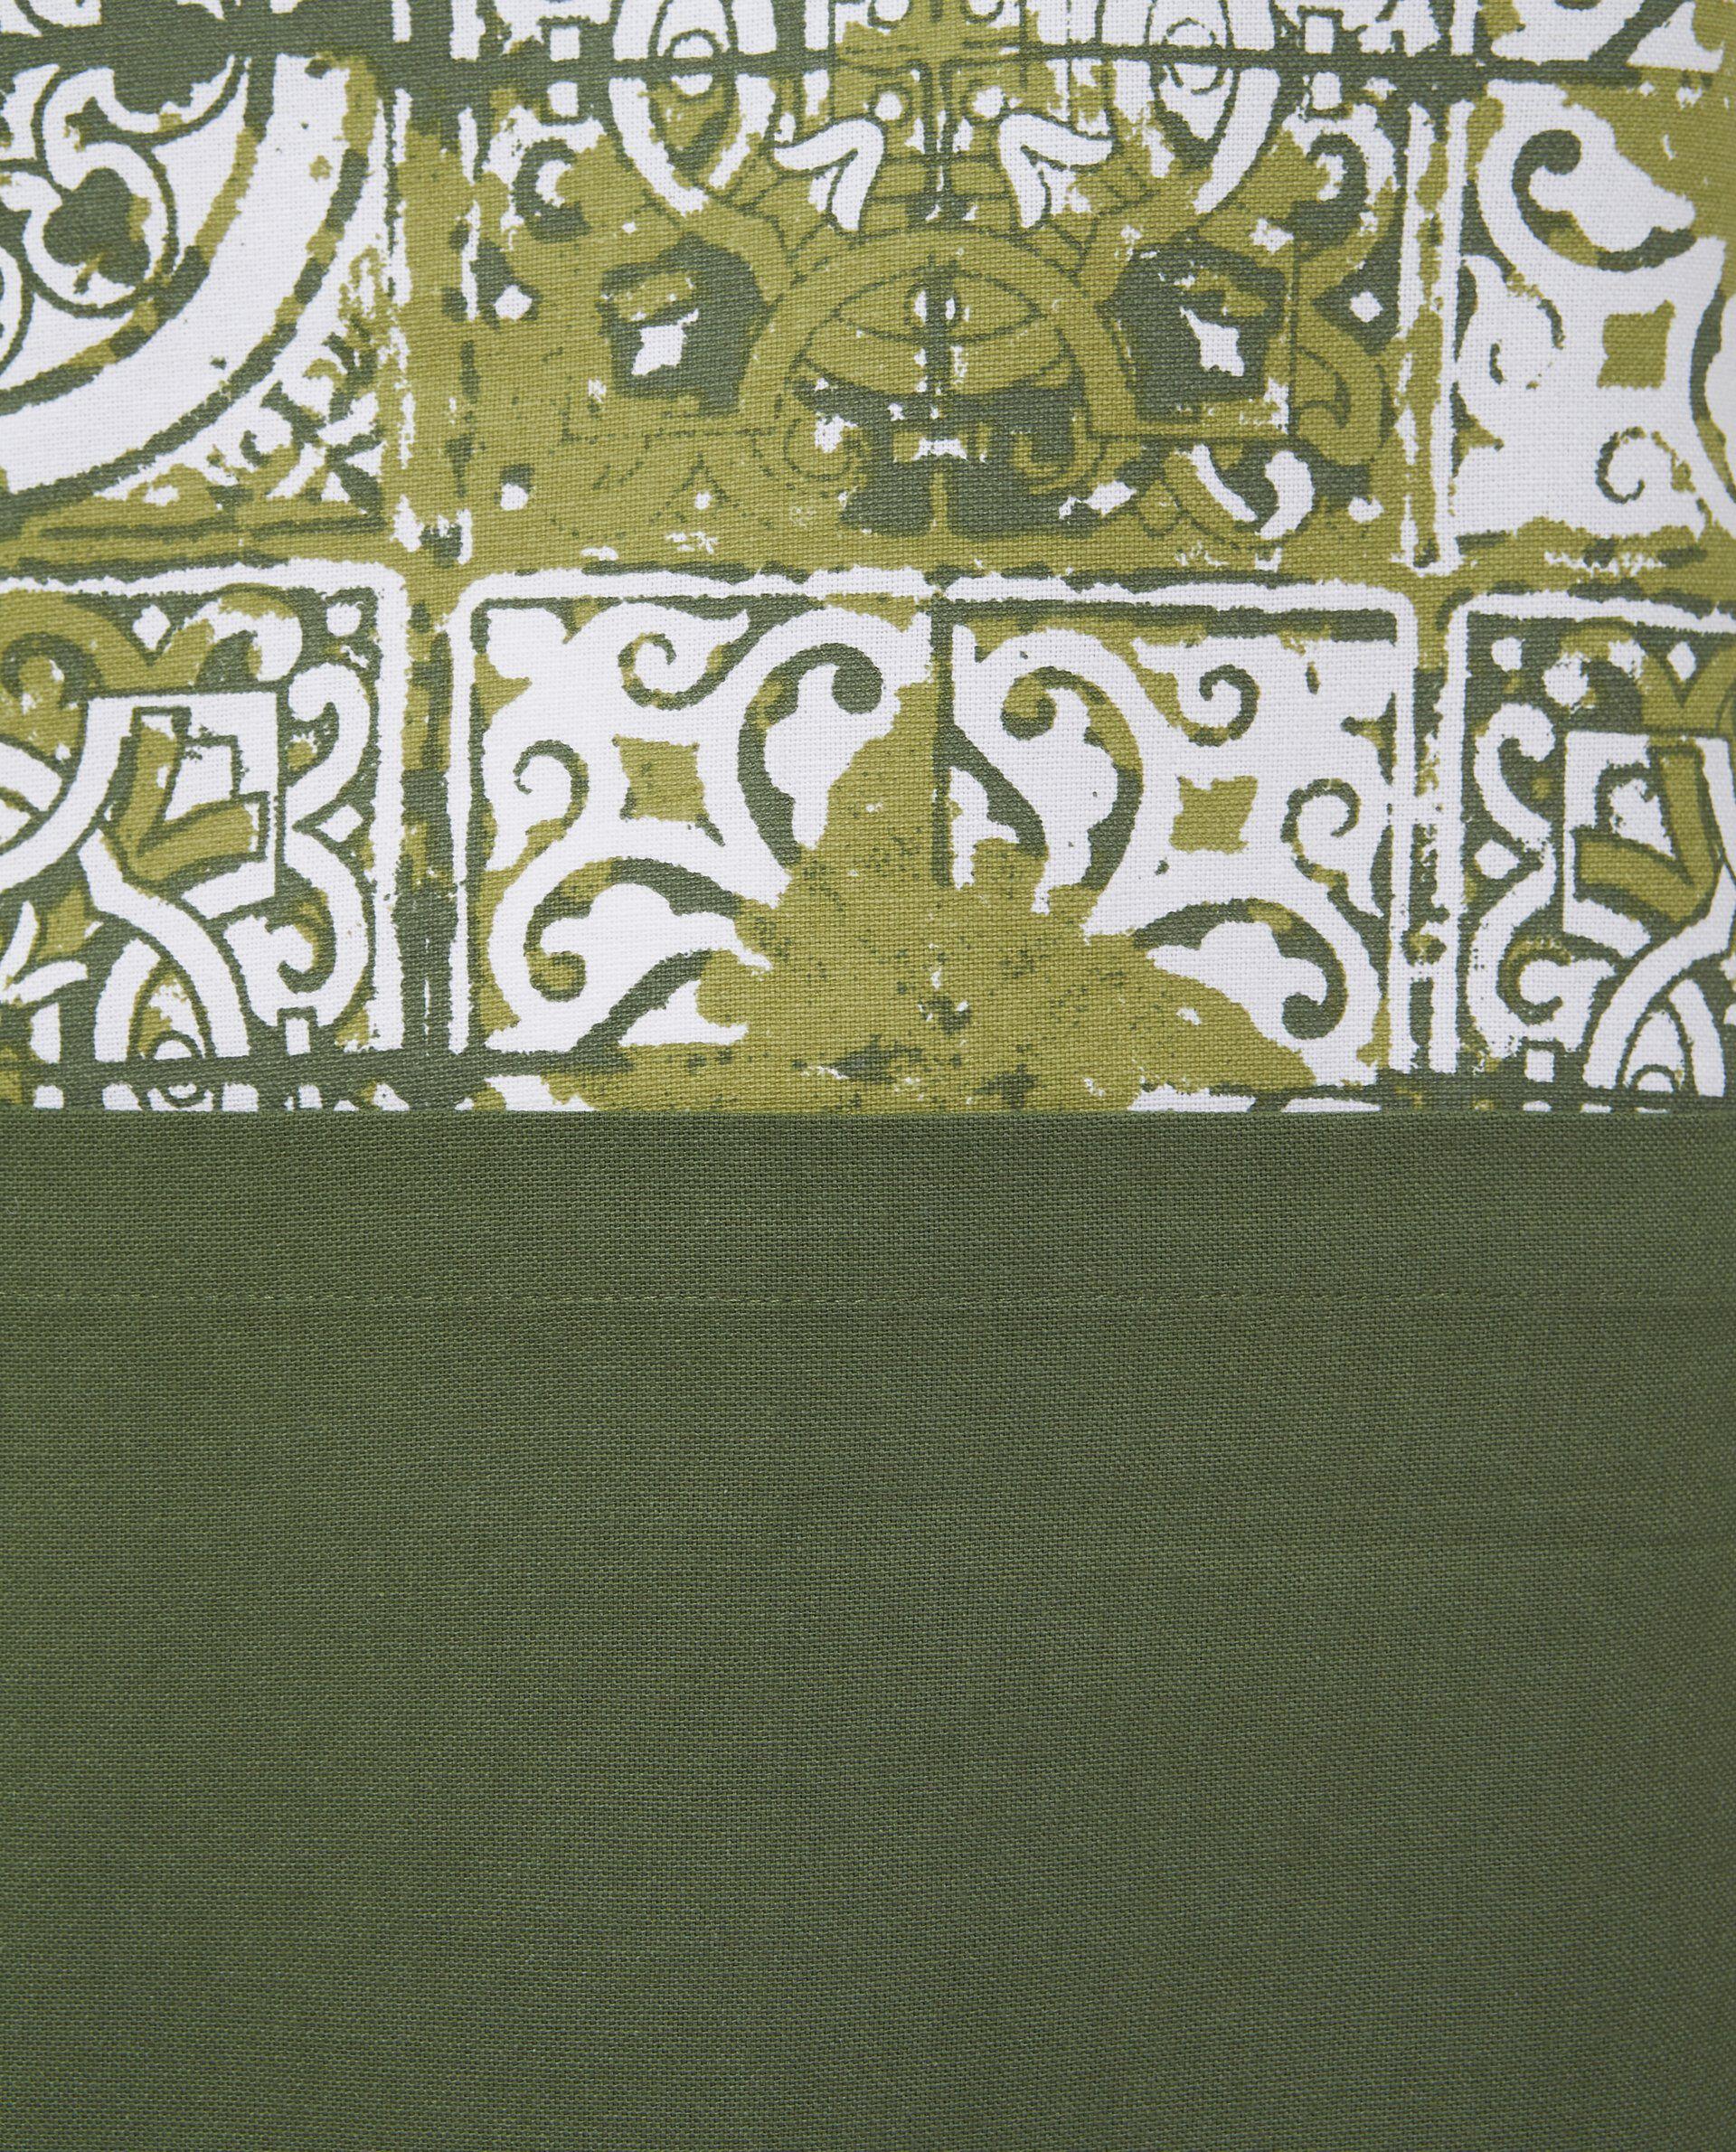 Grembiule cotone stampa piastrelle